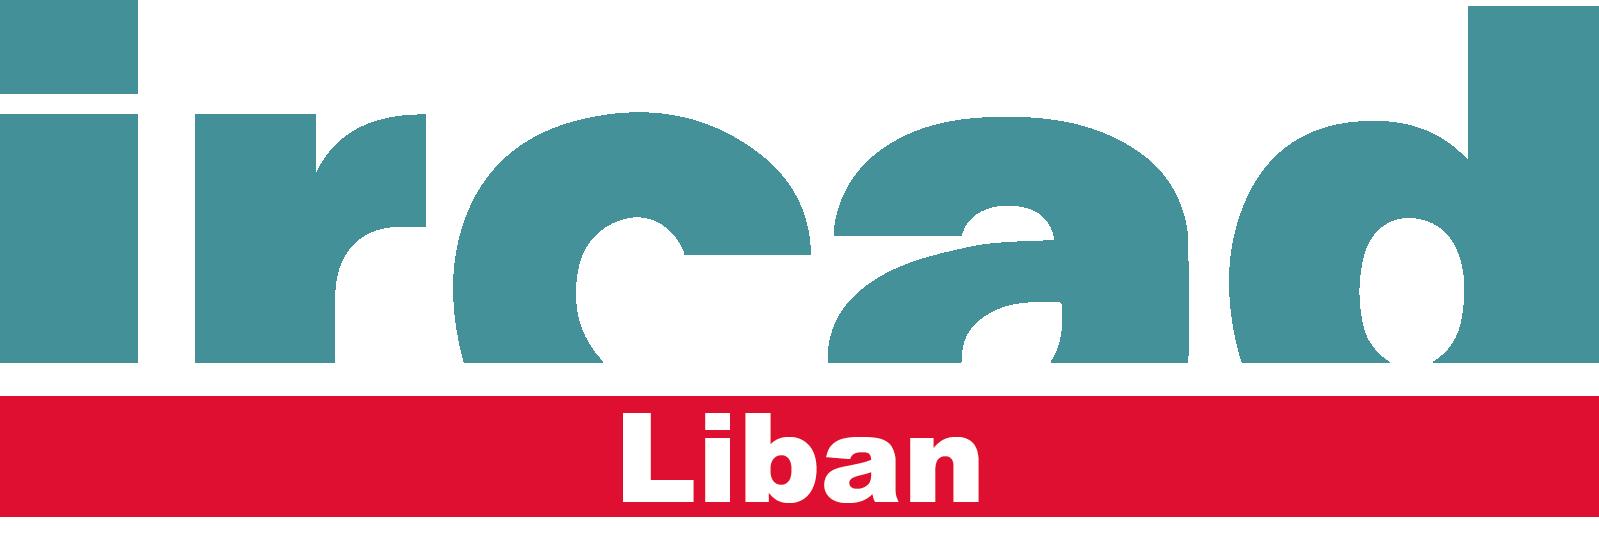 Ircad Liban logo